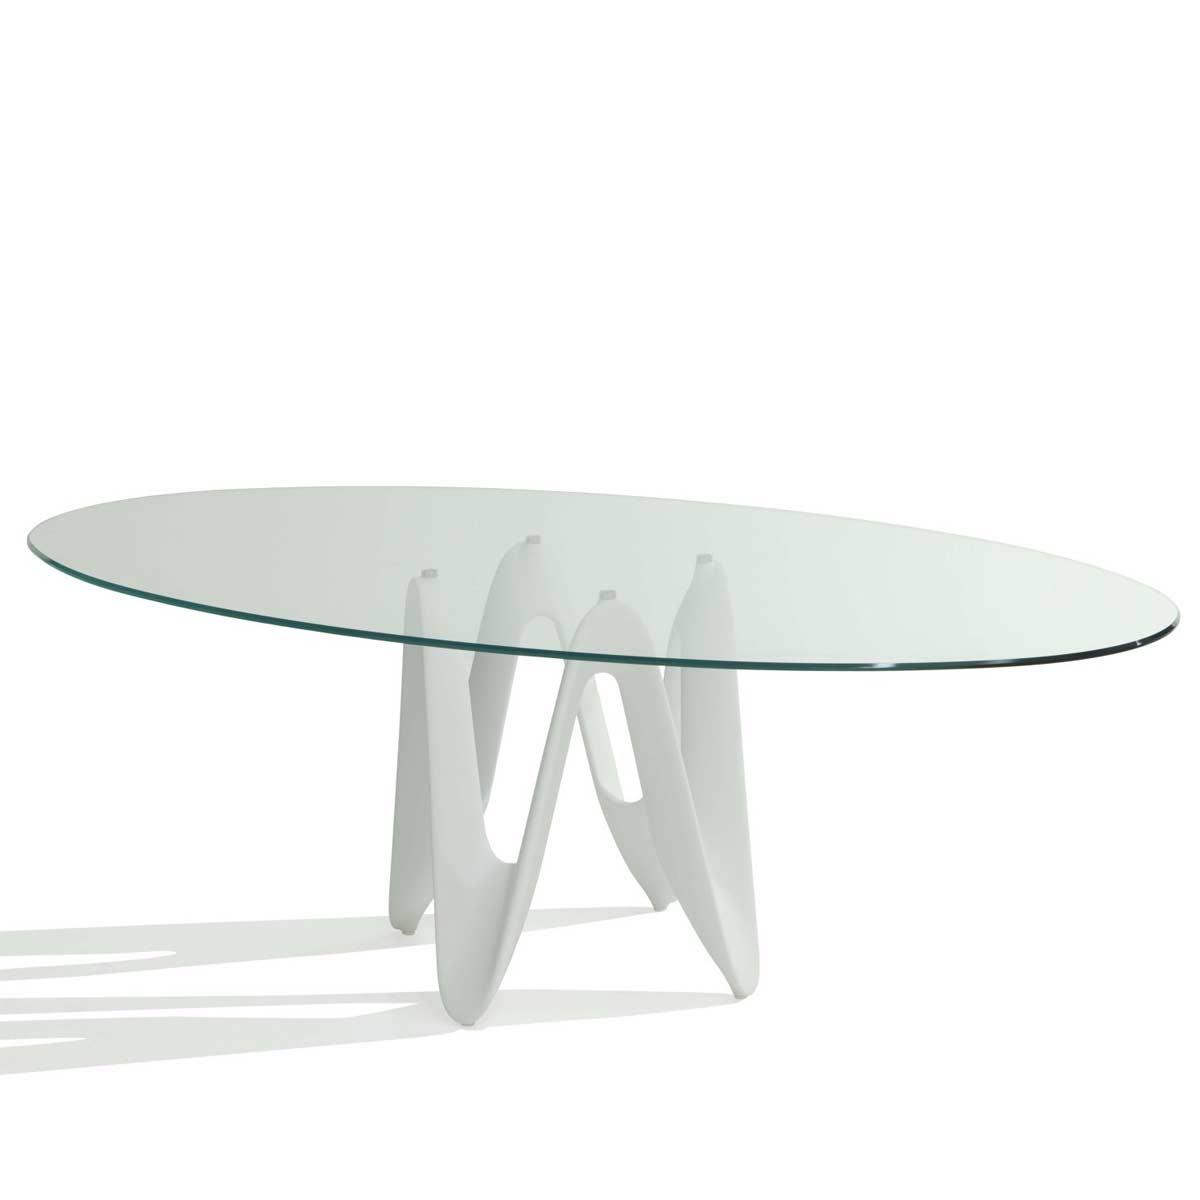 klarity  glass furniture shop  glass dining tables  wood  glass diningtables  lambda oval glass dining table. lambda oval glass dining table  klarity  glass furniture